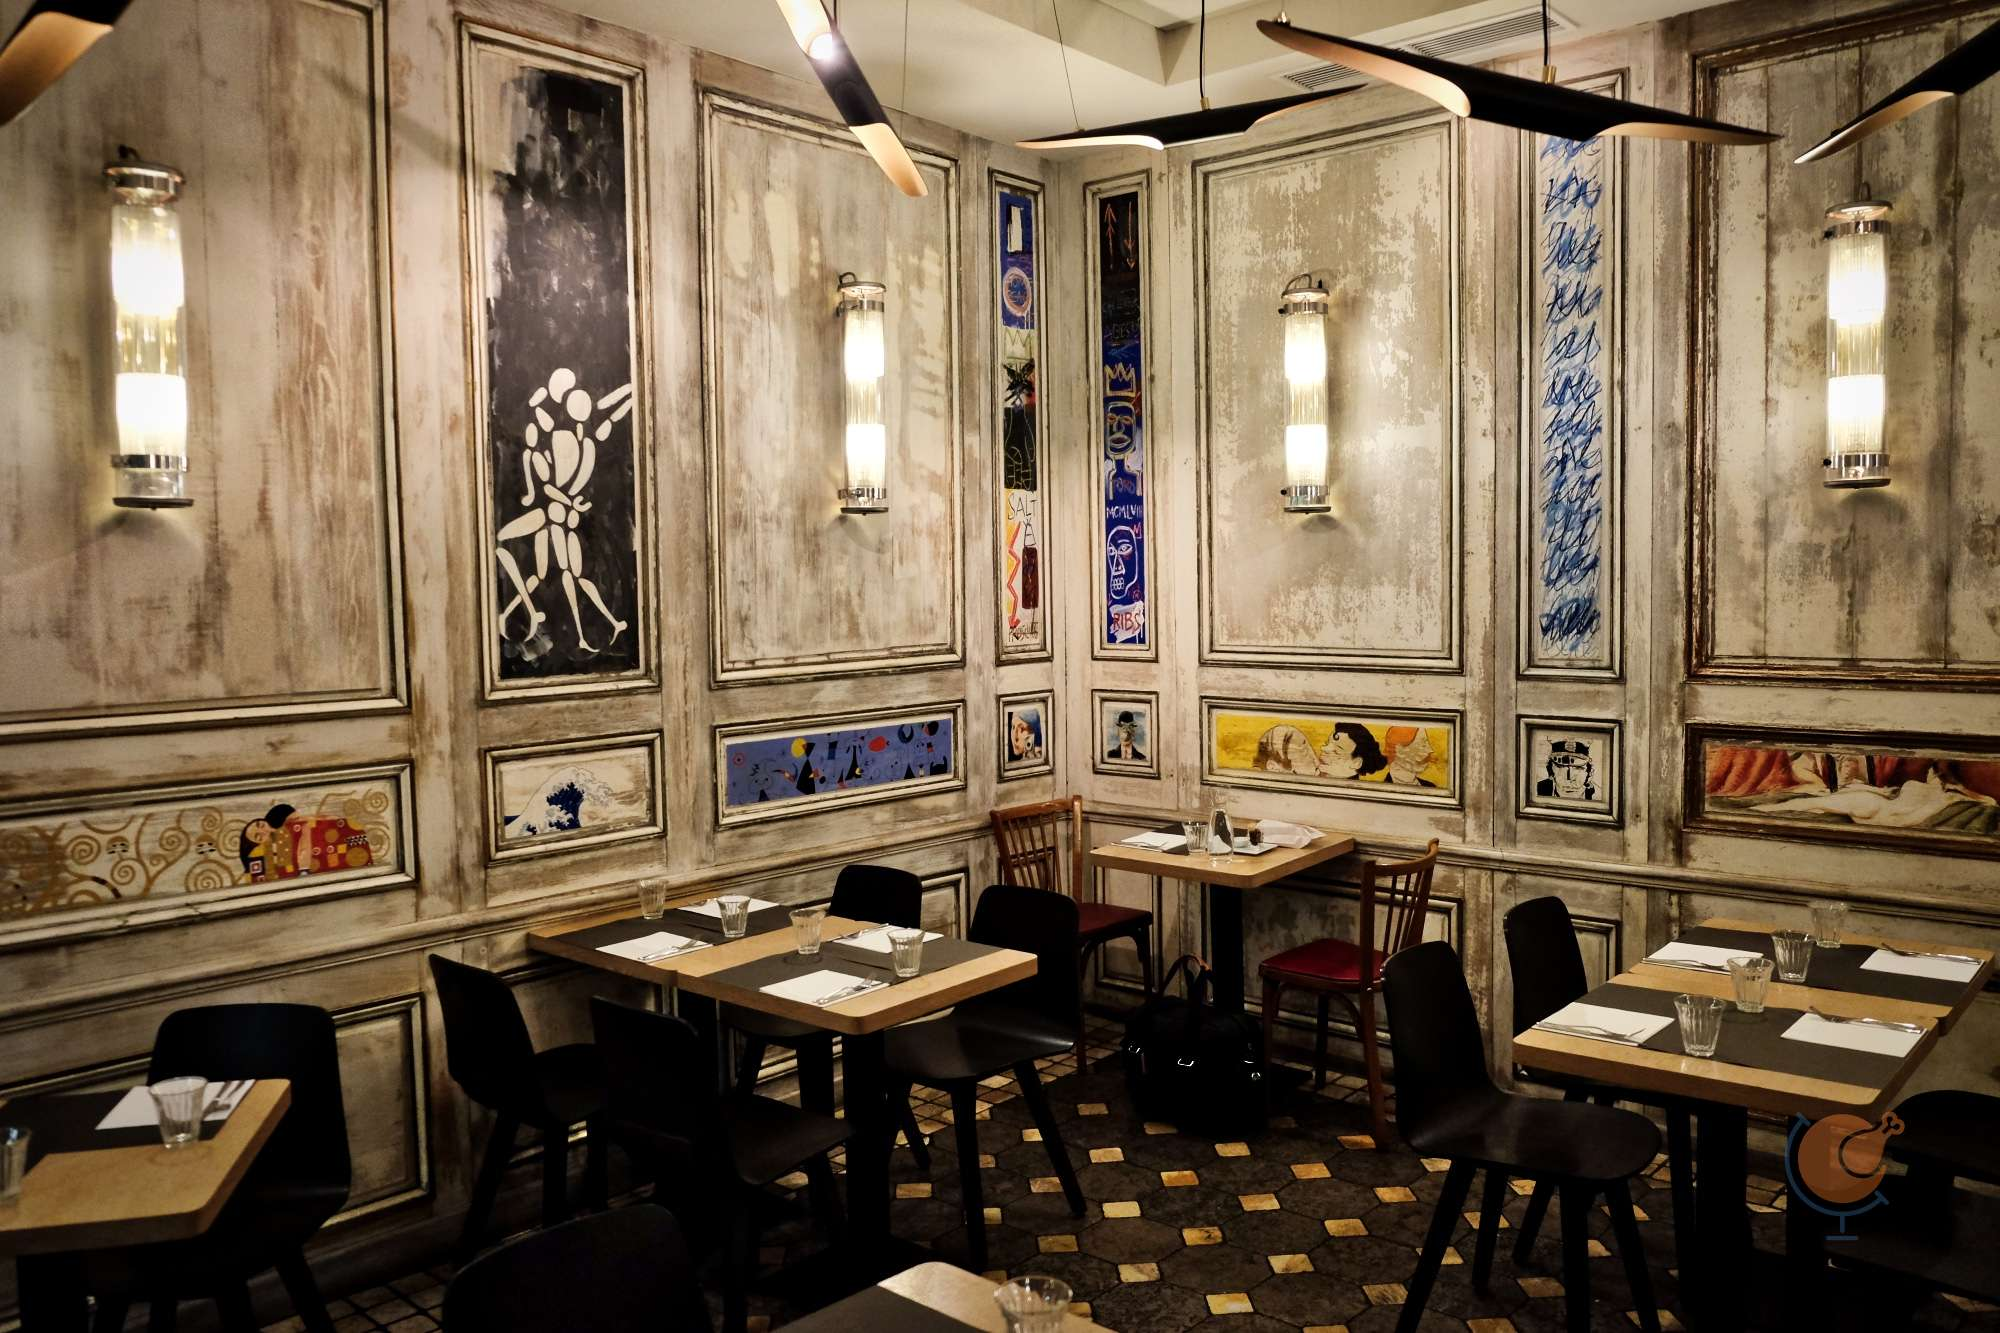 dscf1422_bar_des_oiseaux_restaurant_france_nice_nizza_vilagevo_jokuti_andras_l_w.jpg